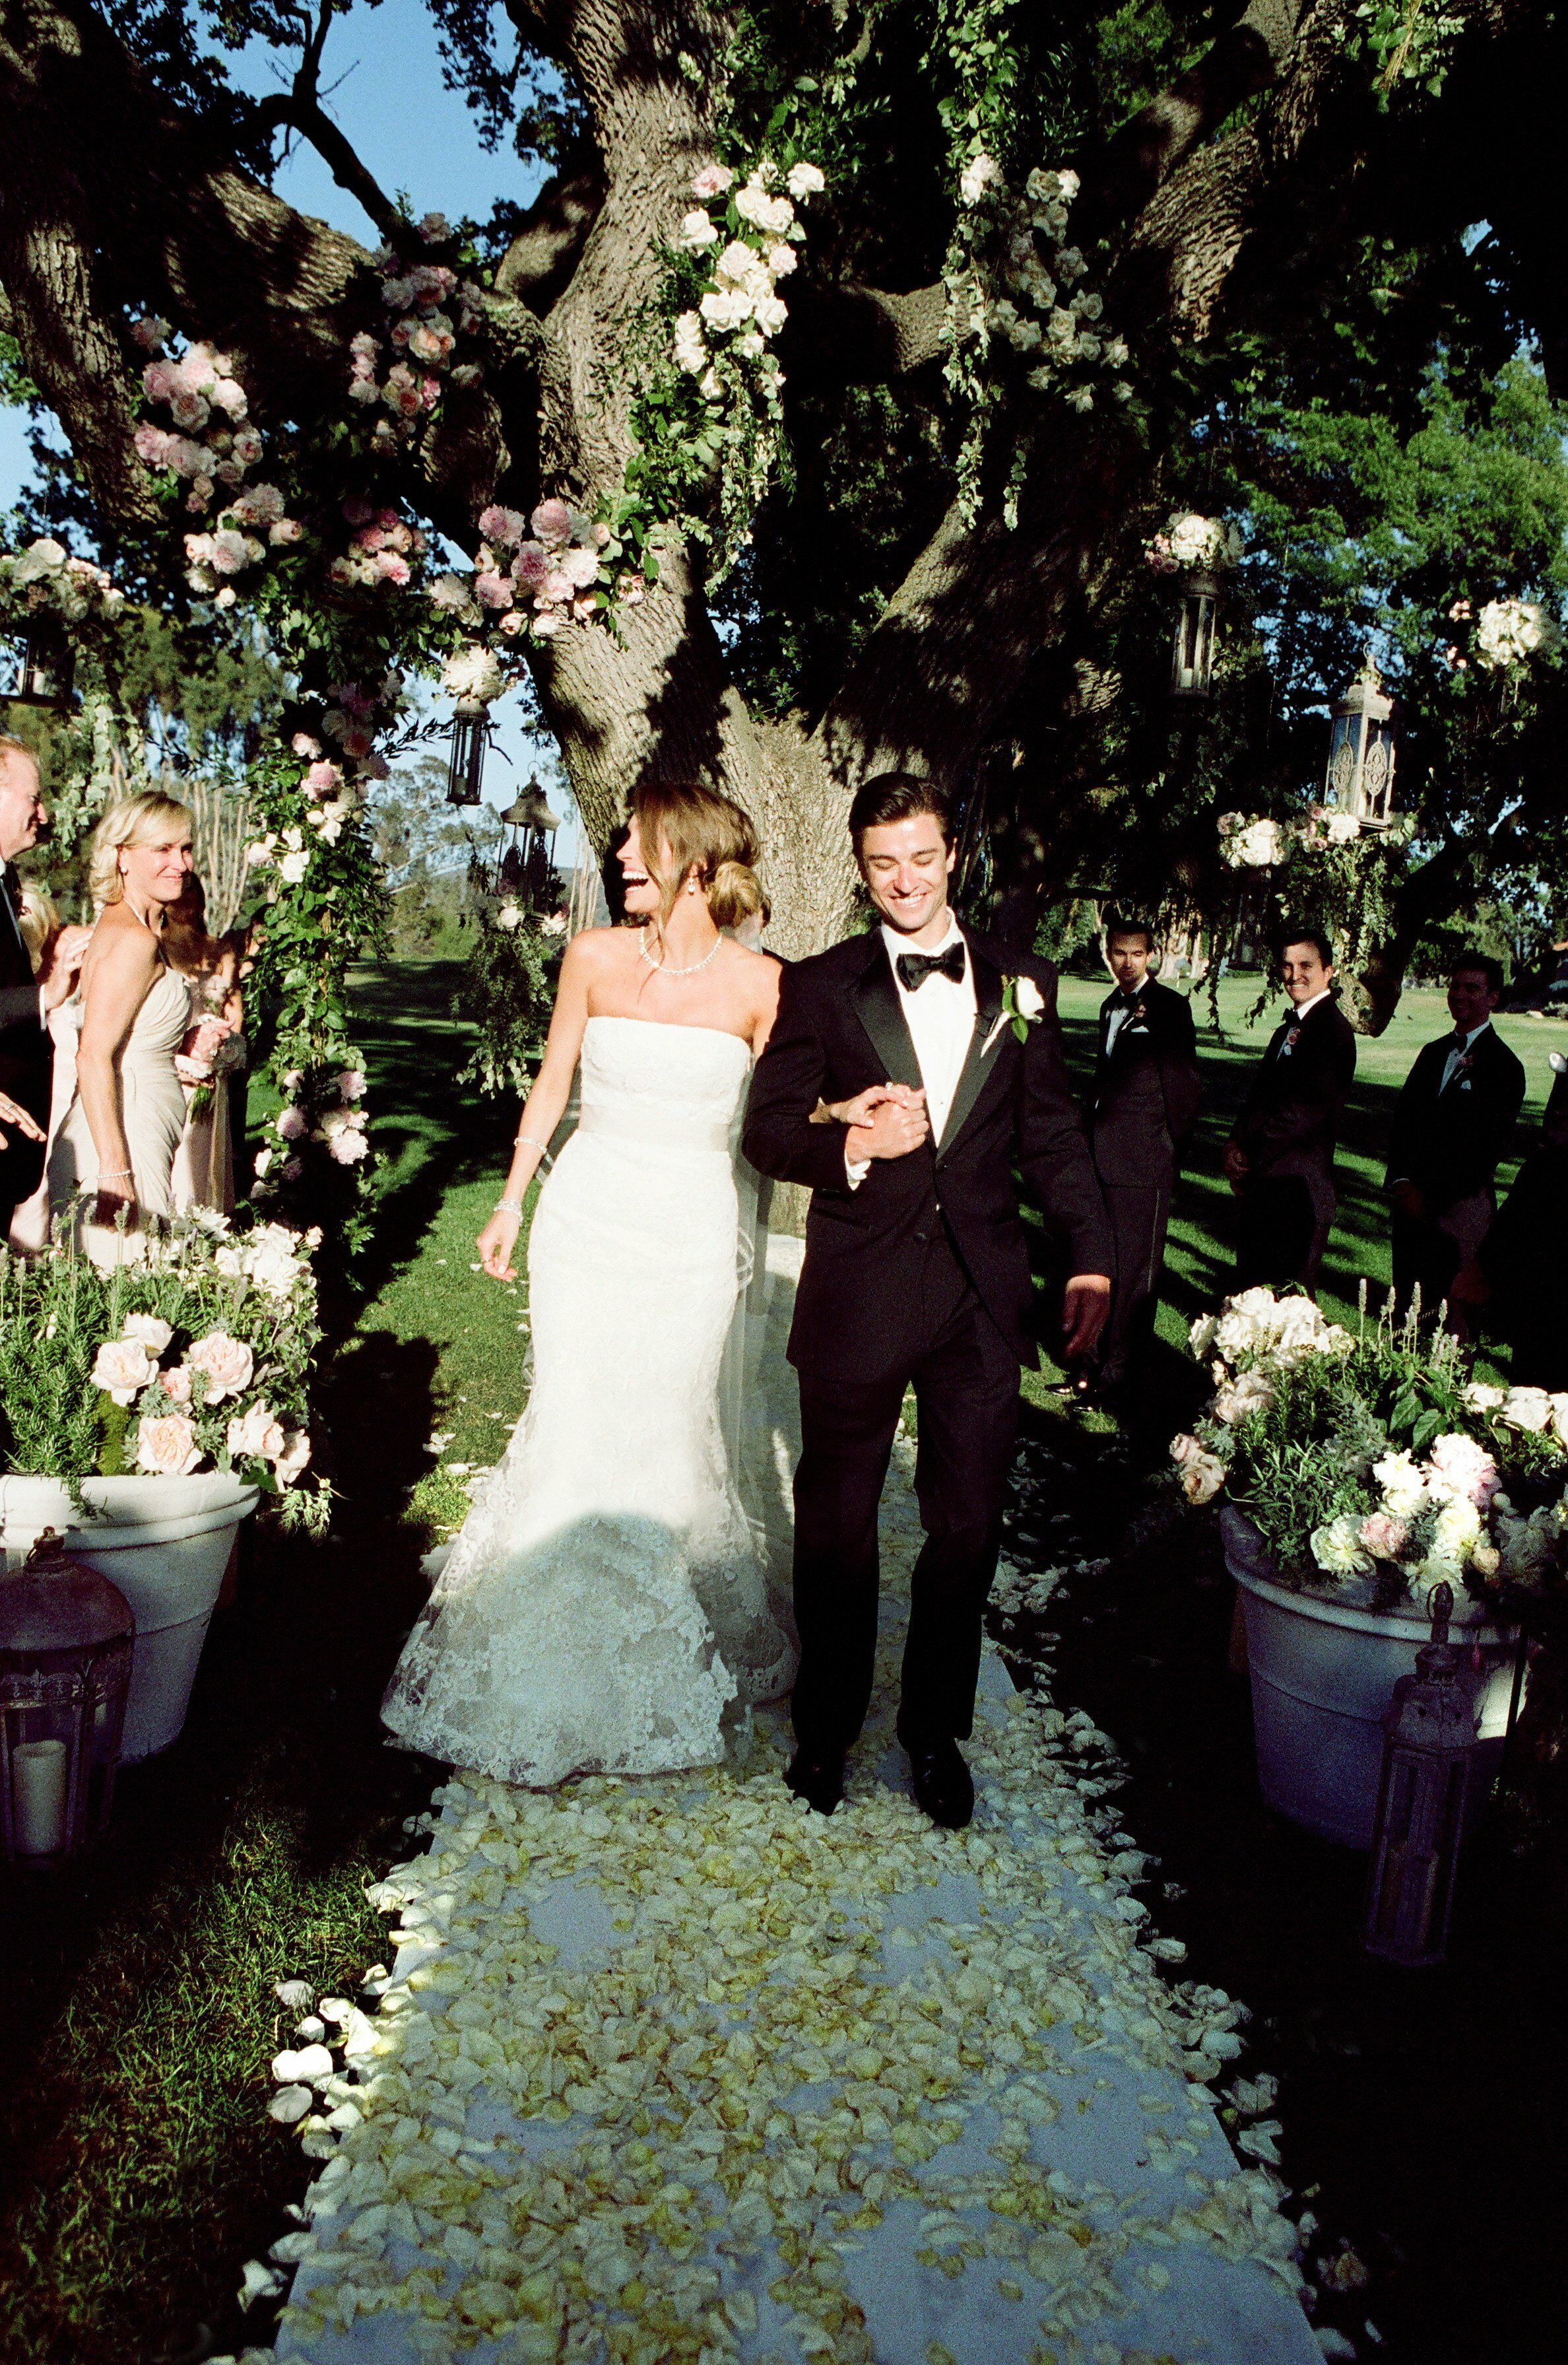 Ojai Valley Inn Rooms Suites: An Ojai Valley Inn And Spa Wedding In Ojai, California